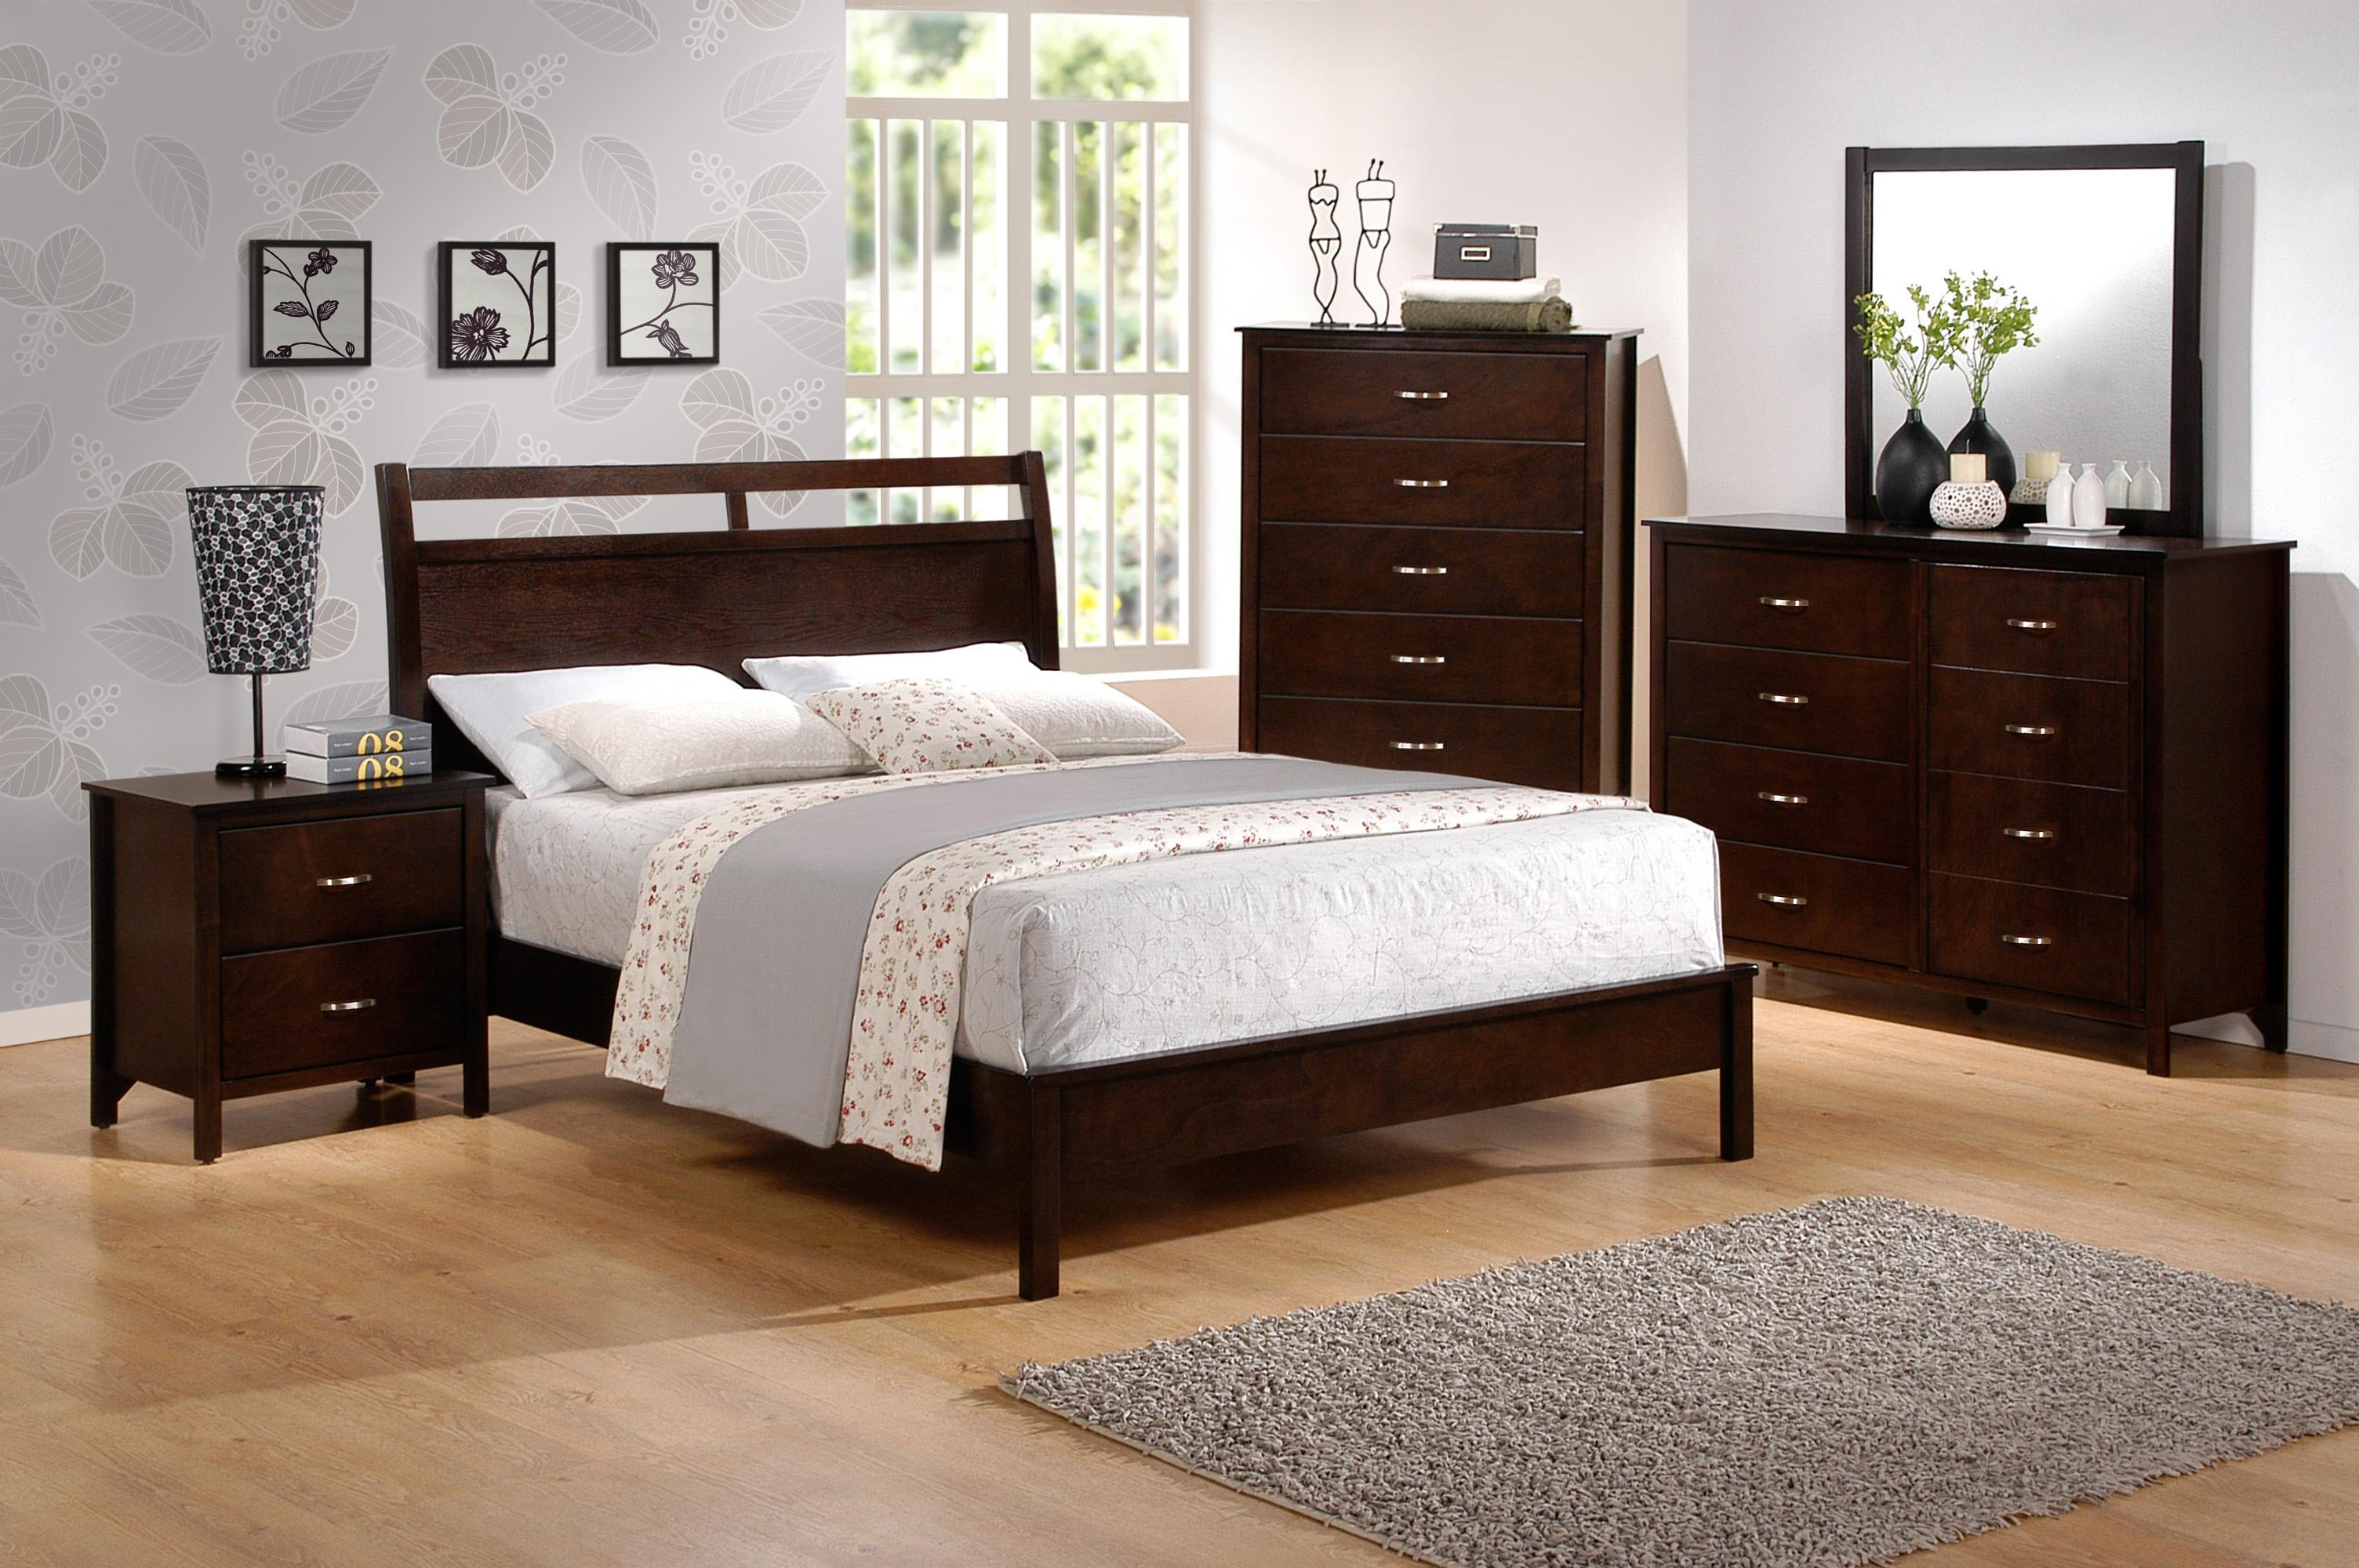 Crown Mark Ian Full Bedroom Group - Item Number: B7300 Full Bedroom Group 1